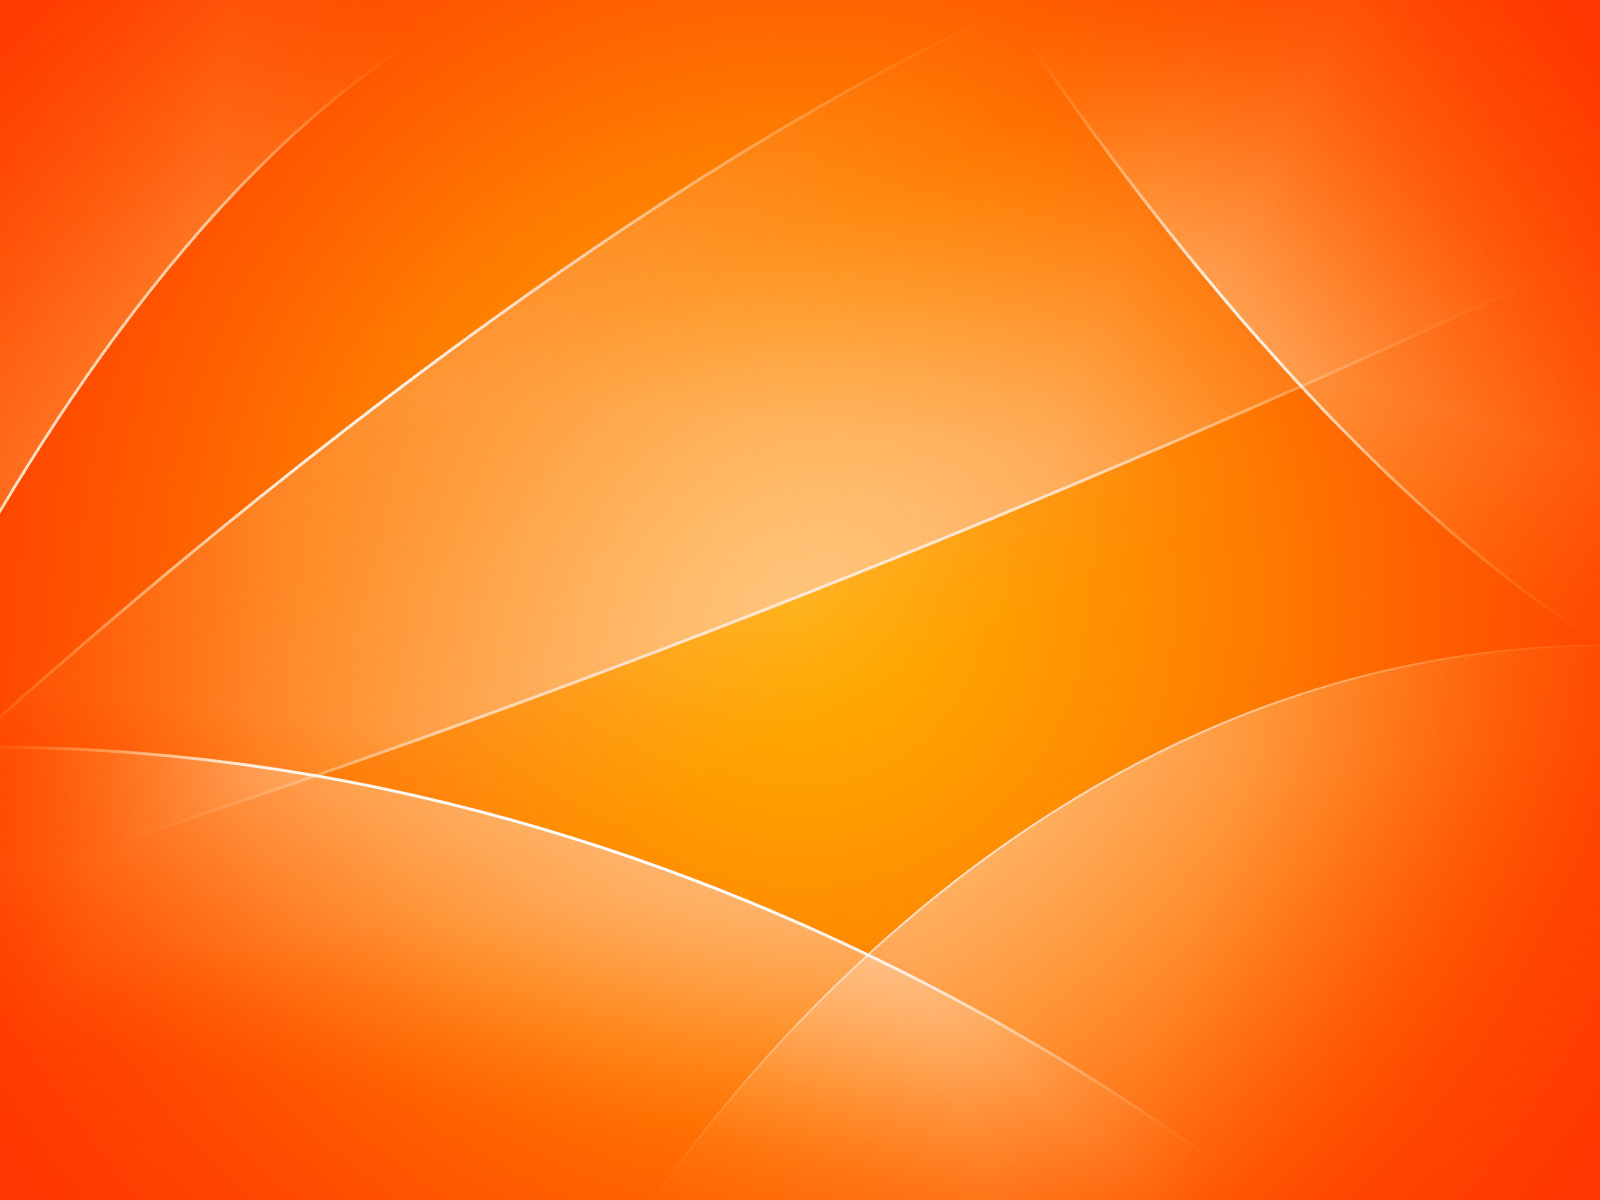 Orange wallpapers hd free download wallpaper dawallpaperz for Orange wallpaper